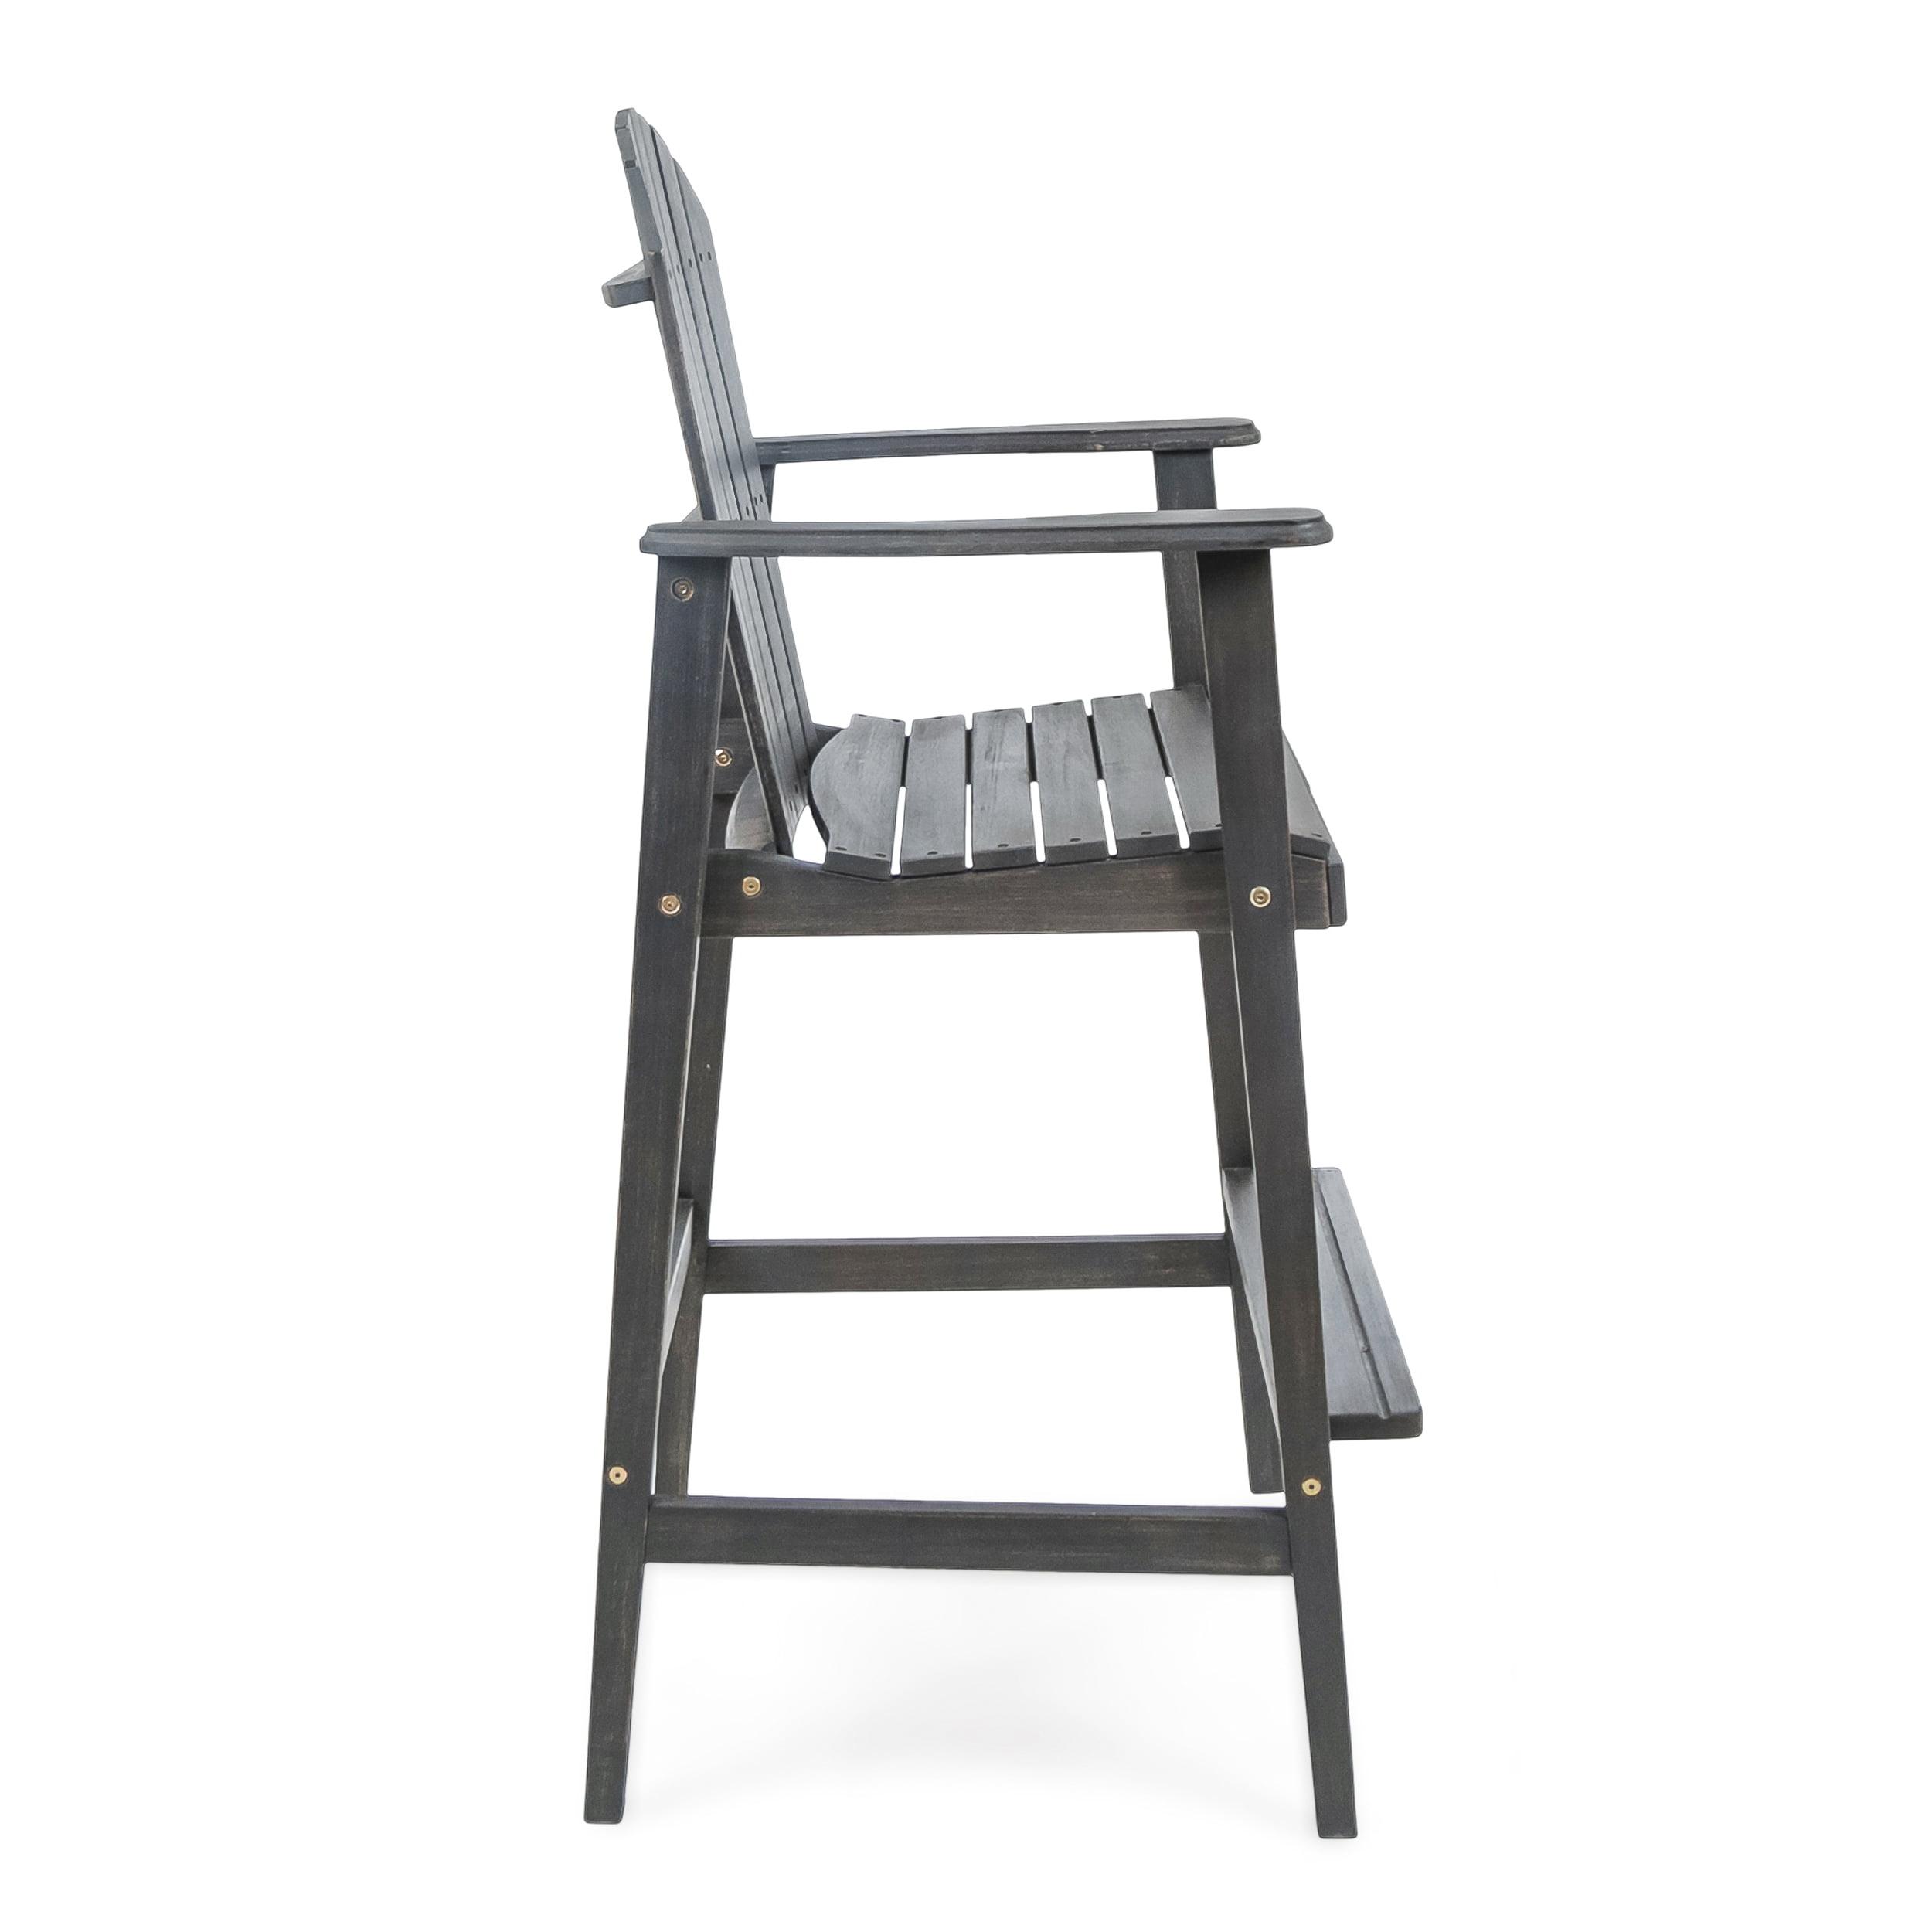 Set of 2 Great Deal Furniture Malibu Outdoor Dark Grey Finished Acacia Wood Adirondack Barstools